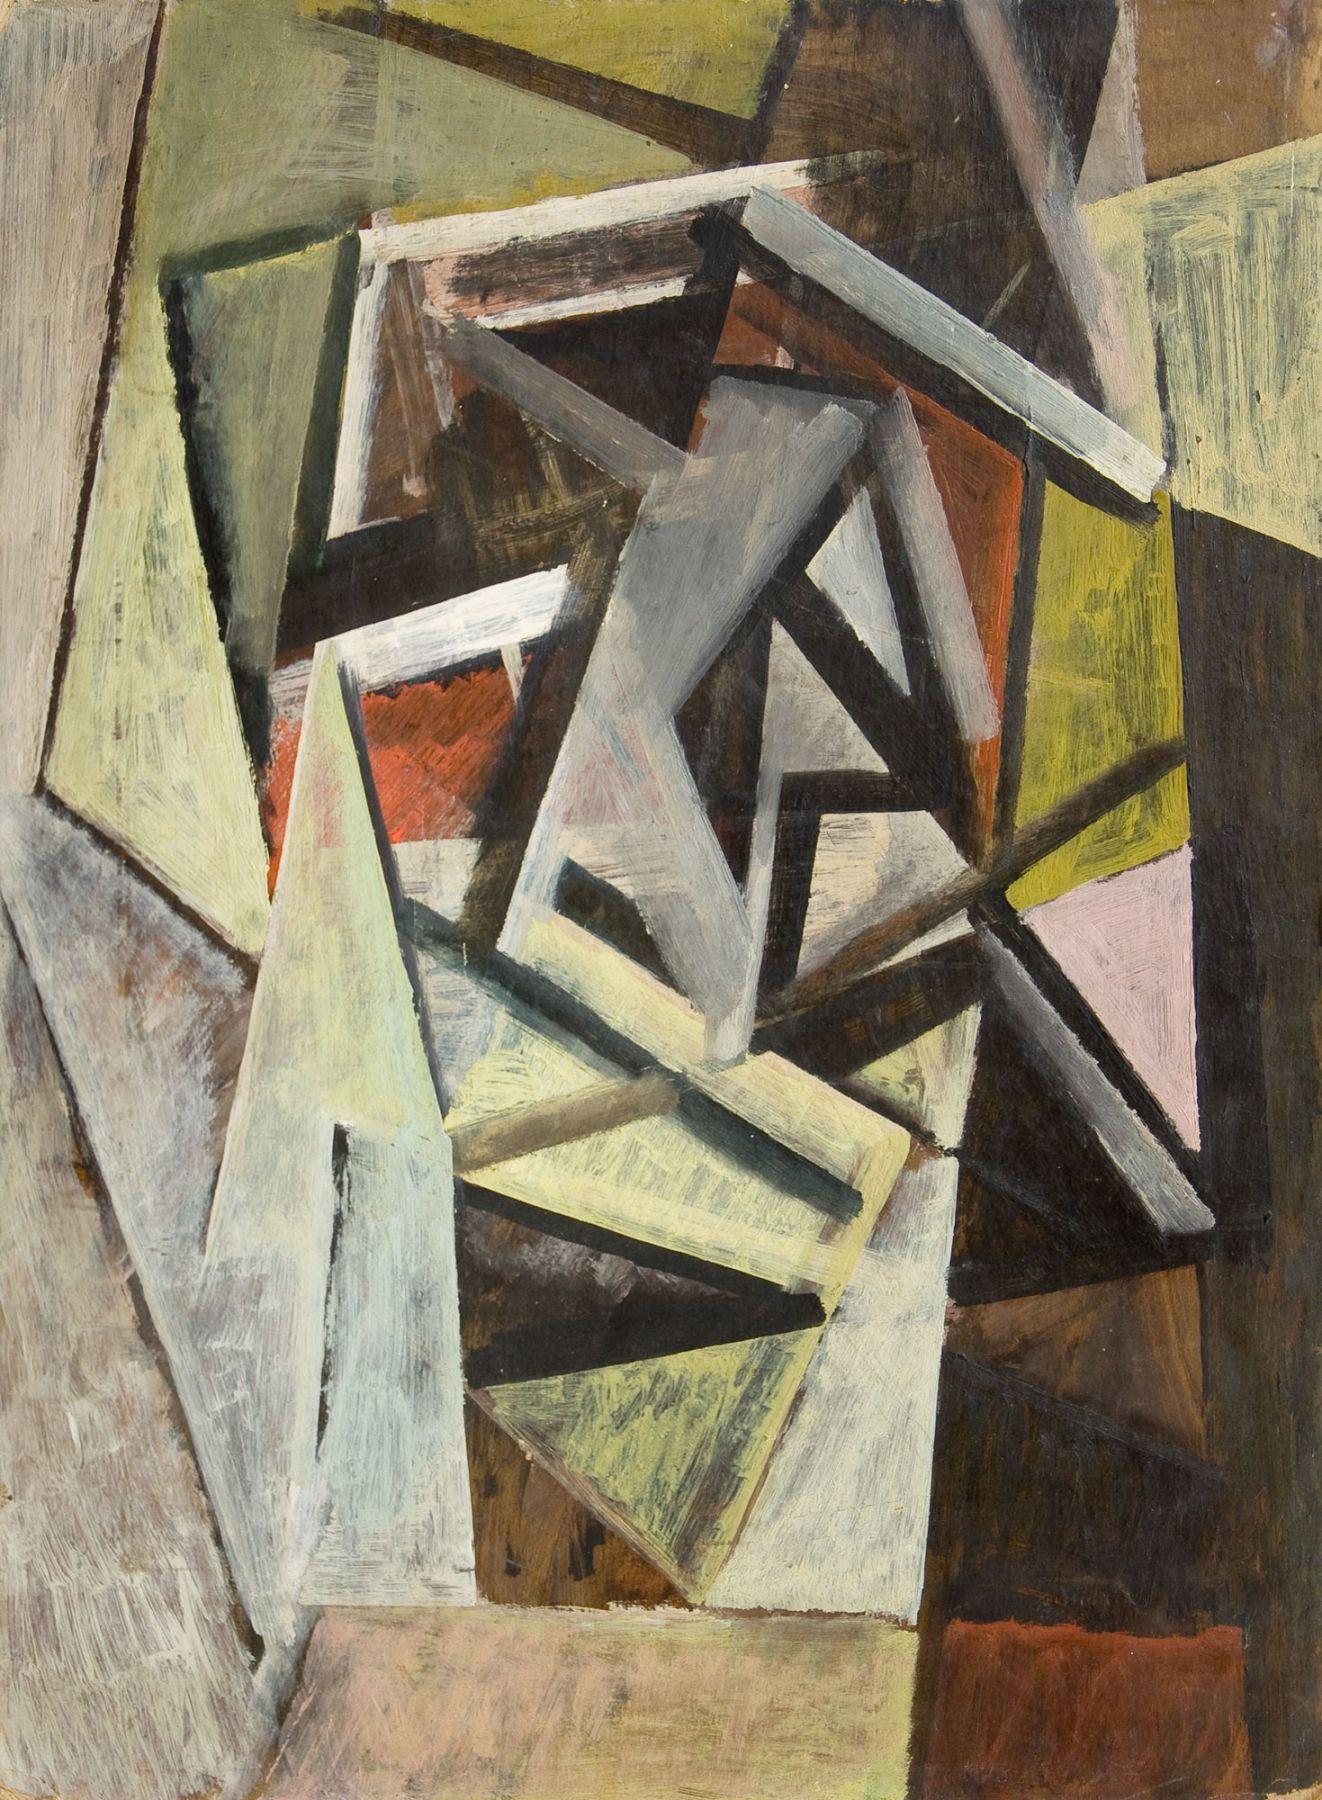 SIDNEY GORDIN (1918-1996), Untitled, c. 1940